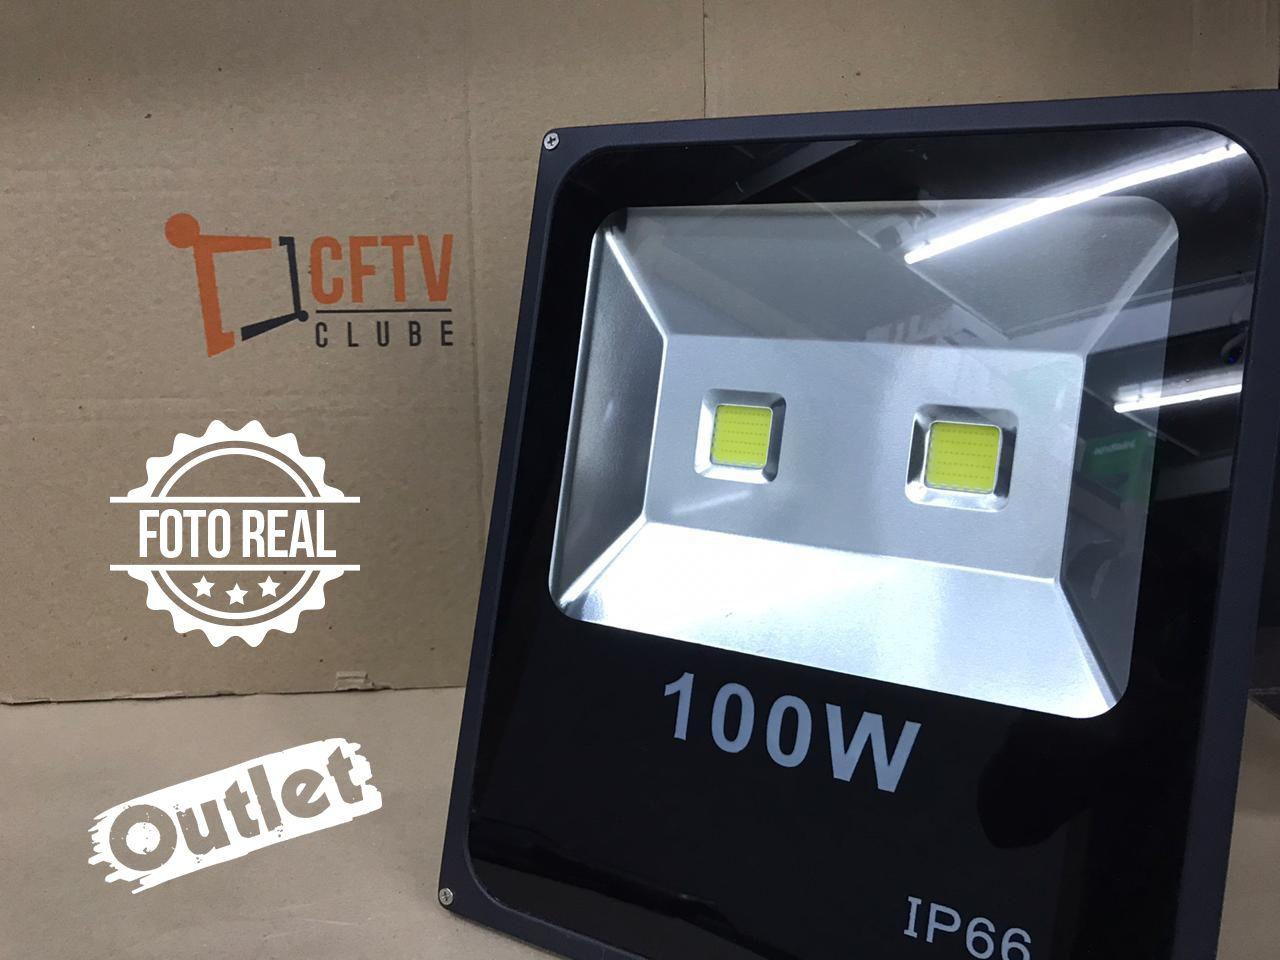 Outlet - Refletor de LED 100w Externo IP66  - CFTV Clube | Brasil